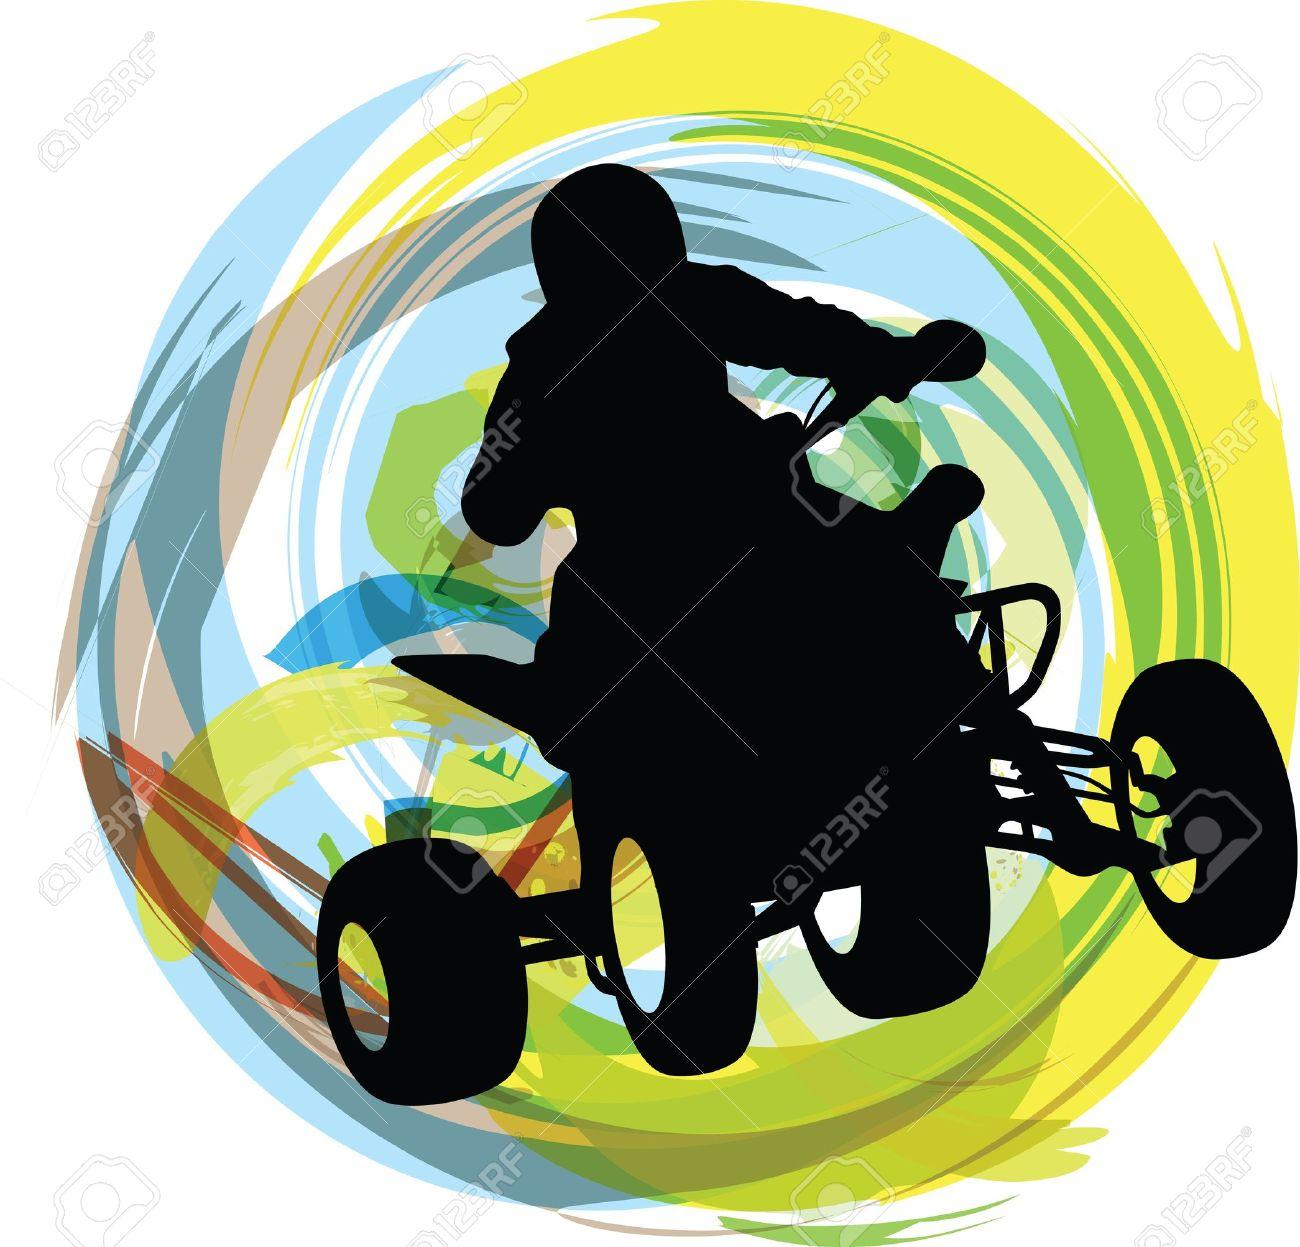 Sketch of Sportsman riding quad bike - 15194832